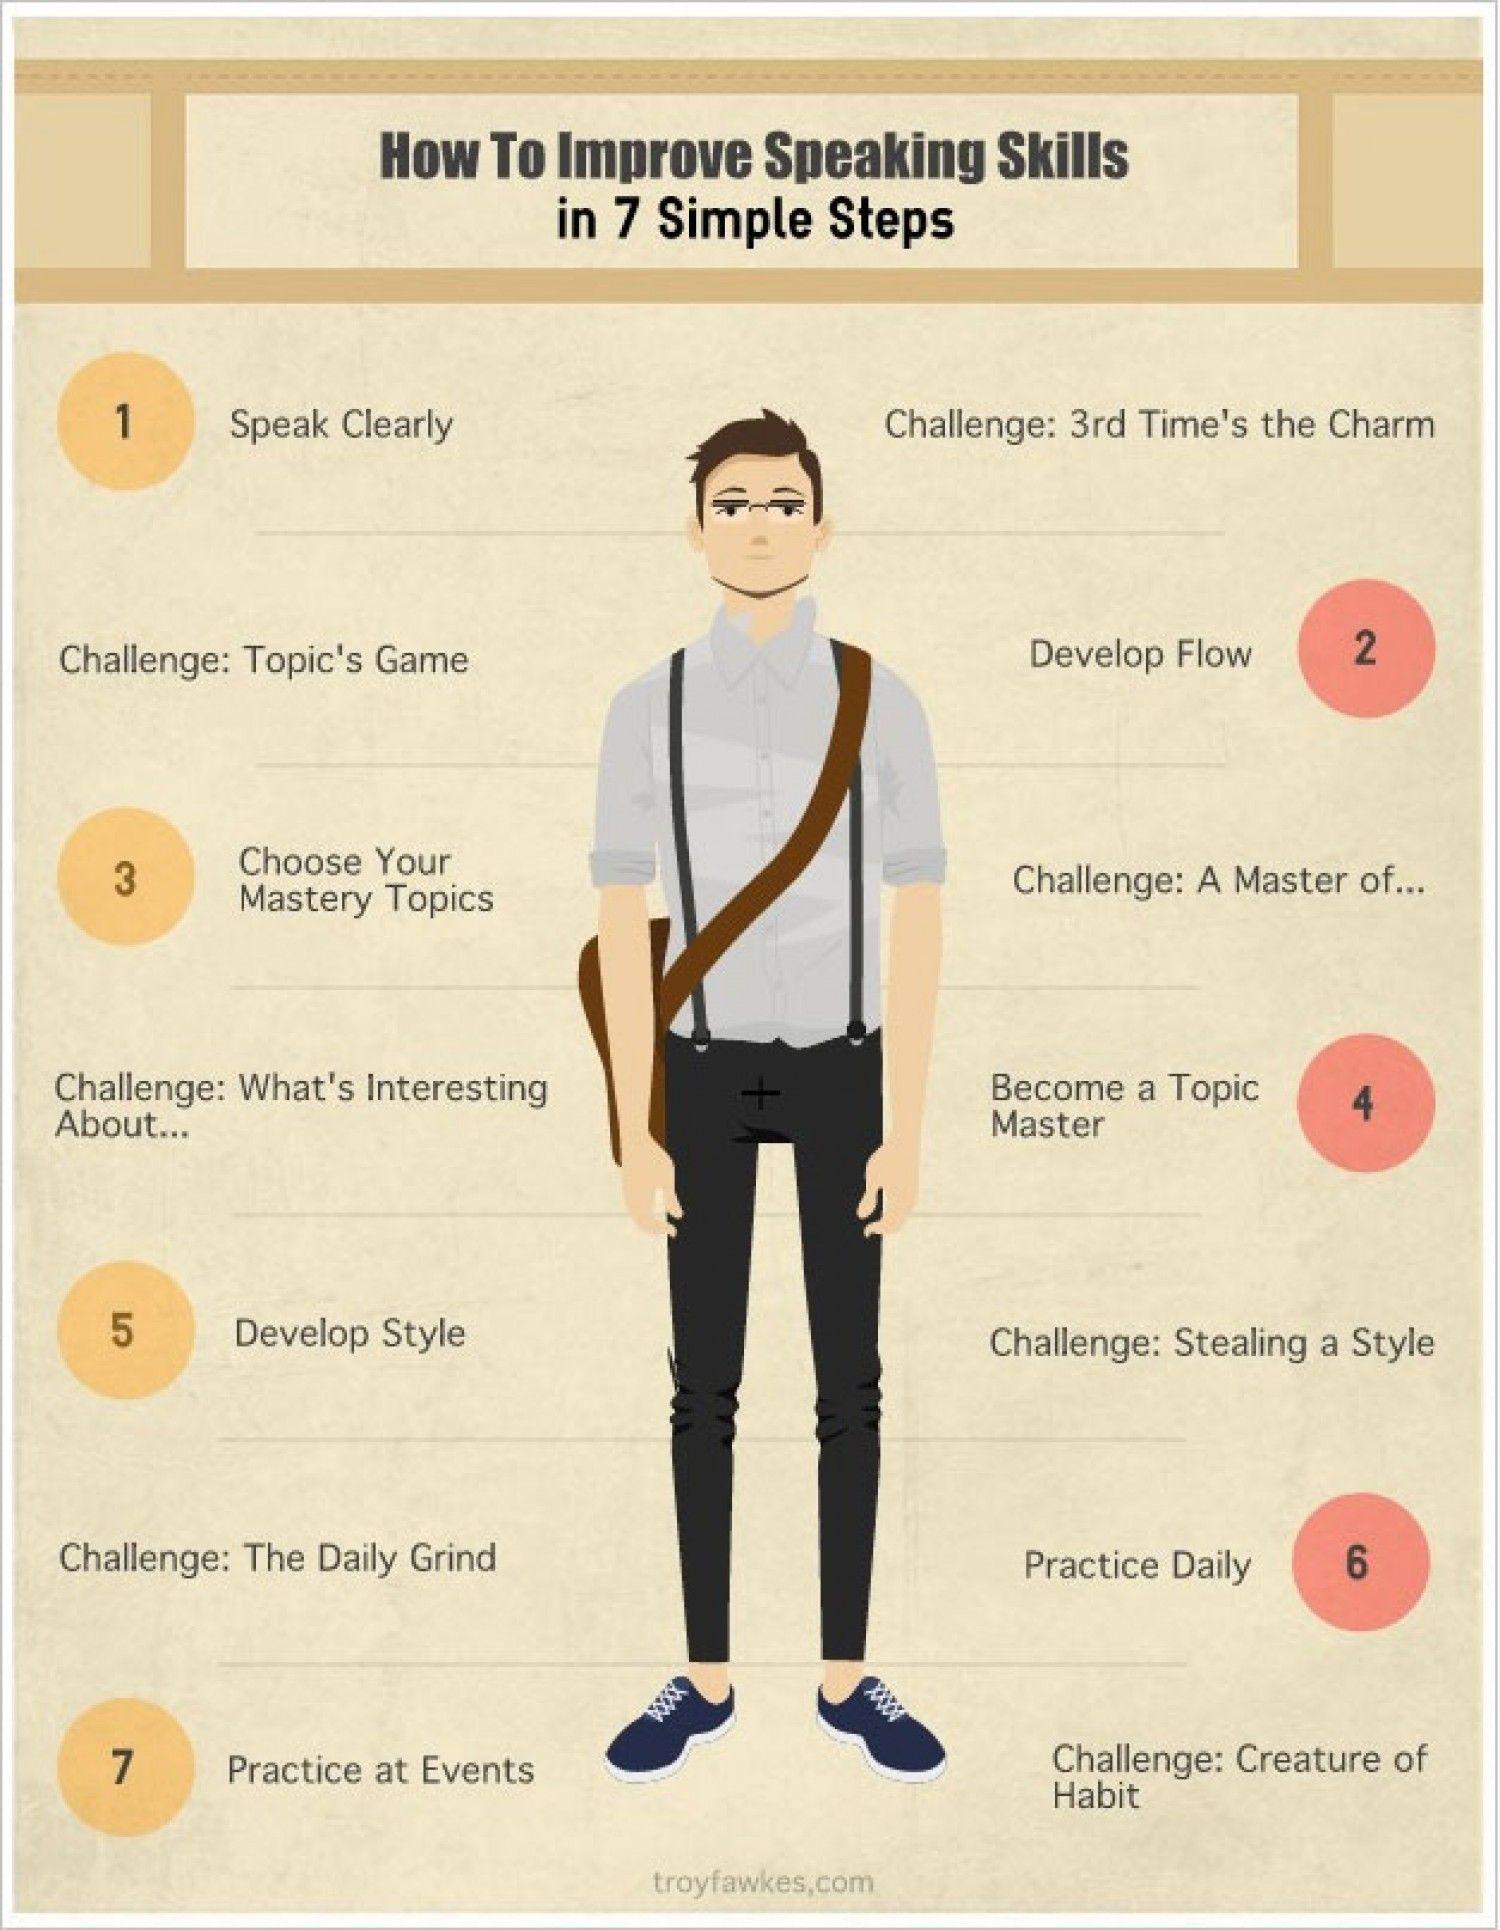 How To Improve Speaking Skills Visual Ly Improve Speaking Skills Speaking Skills Improve Communication Skills